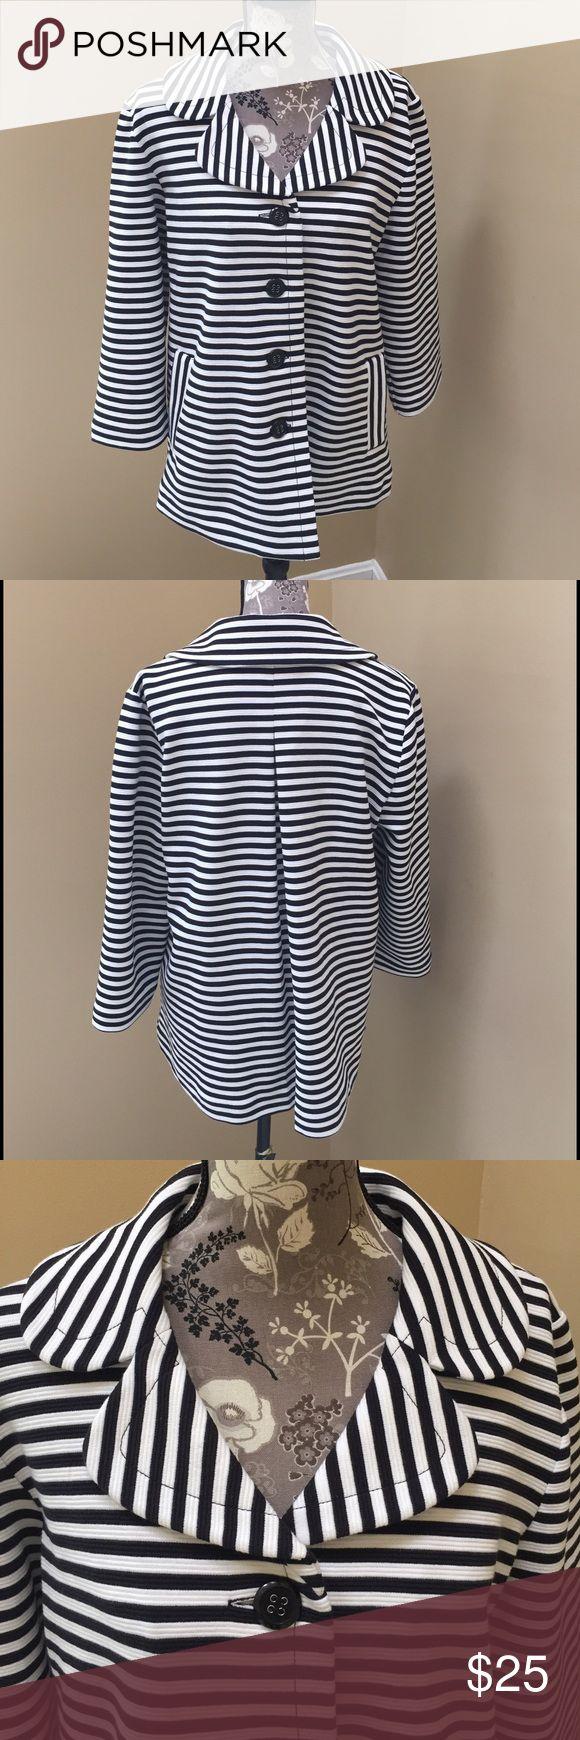 NWOT Pendleton striped jacket NWOT Pendleton black and white stripe jacket. Size large. 67% polyester, 32% cotton, 1% spandex. Super cute and looks great on. Extra button if needed. 3/4 quarter sleeve. pendleton  Jackets & Coats